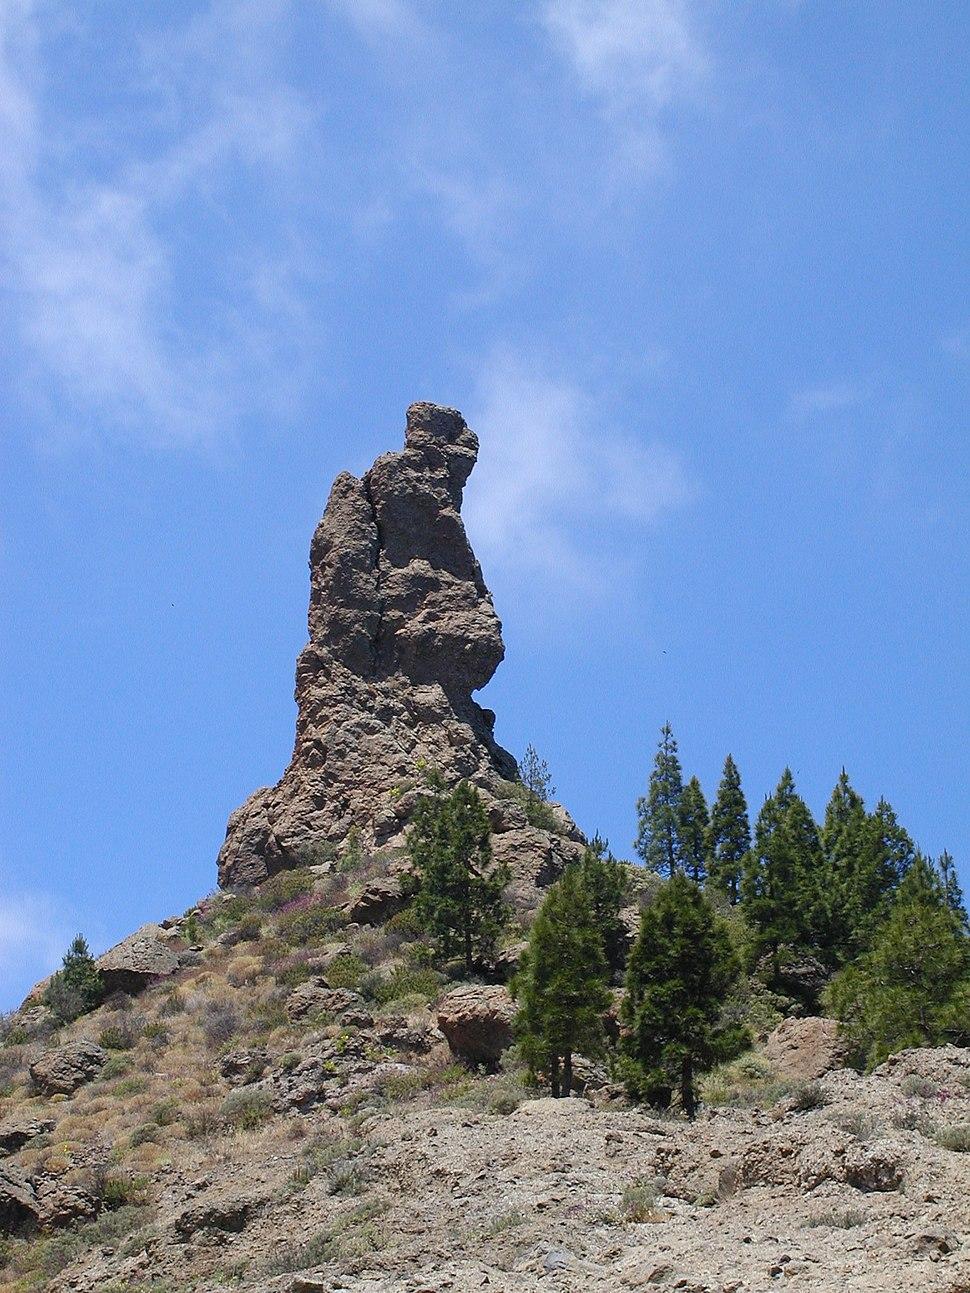 Roque del fraile